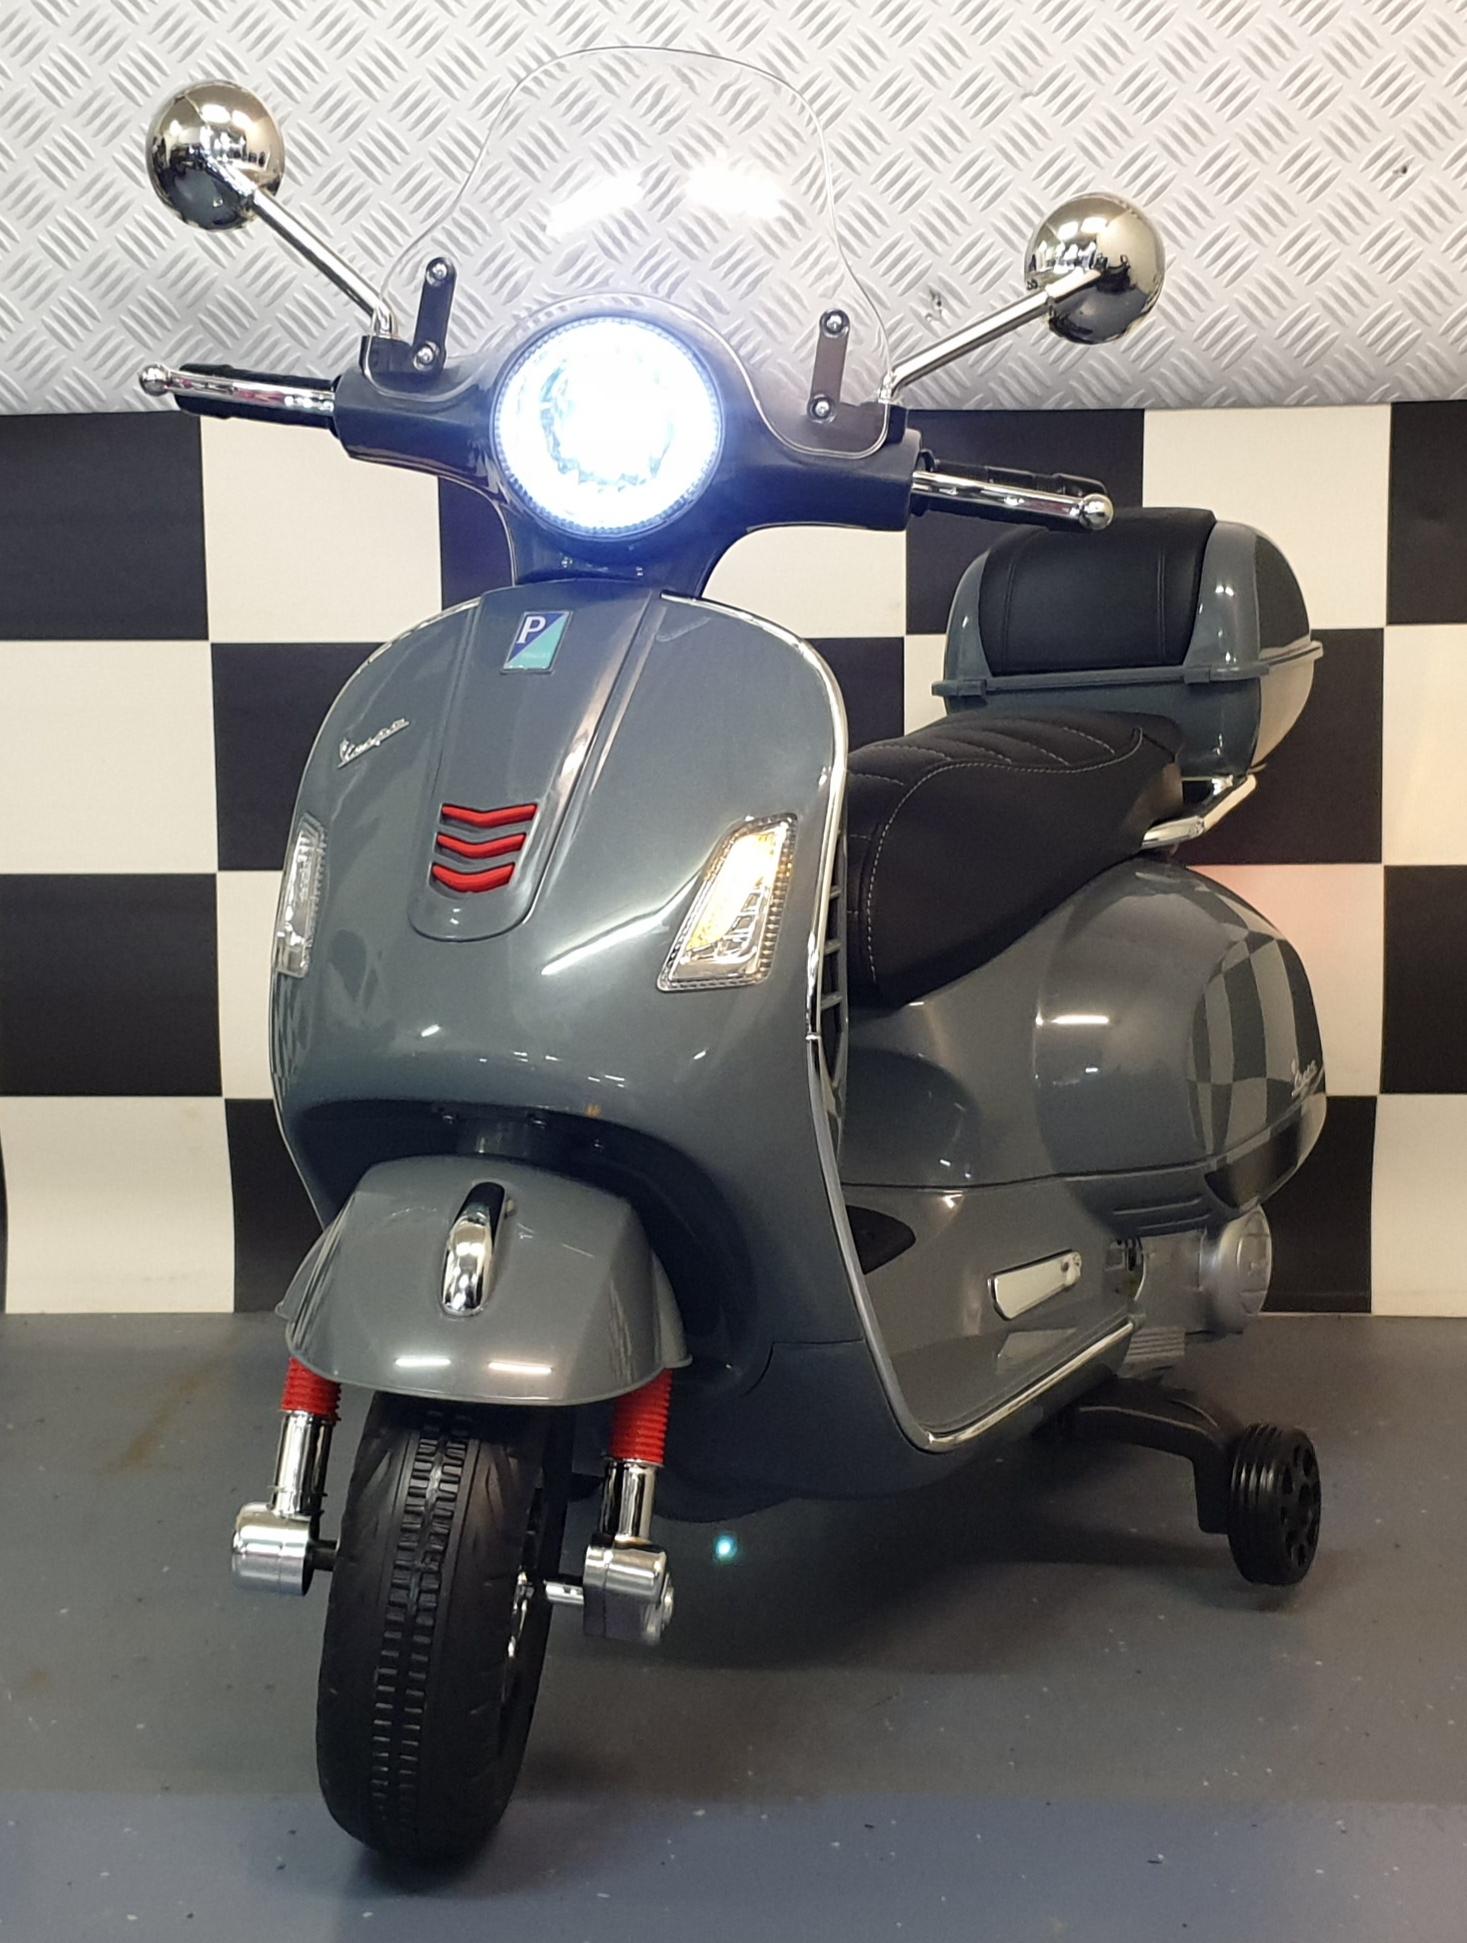 Vespa elektrische kinder accu scooter 12 volt  Grijs